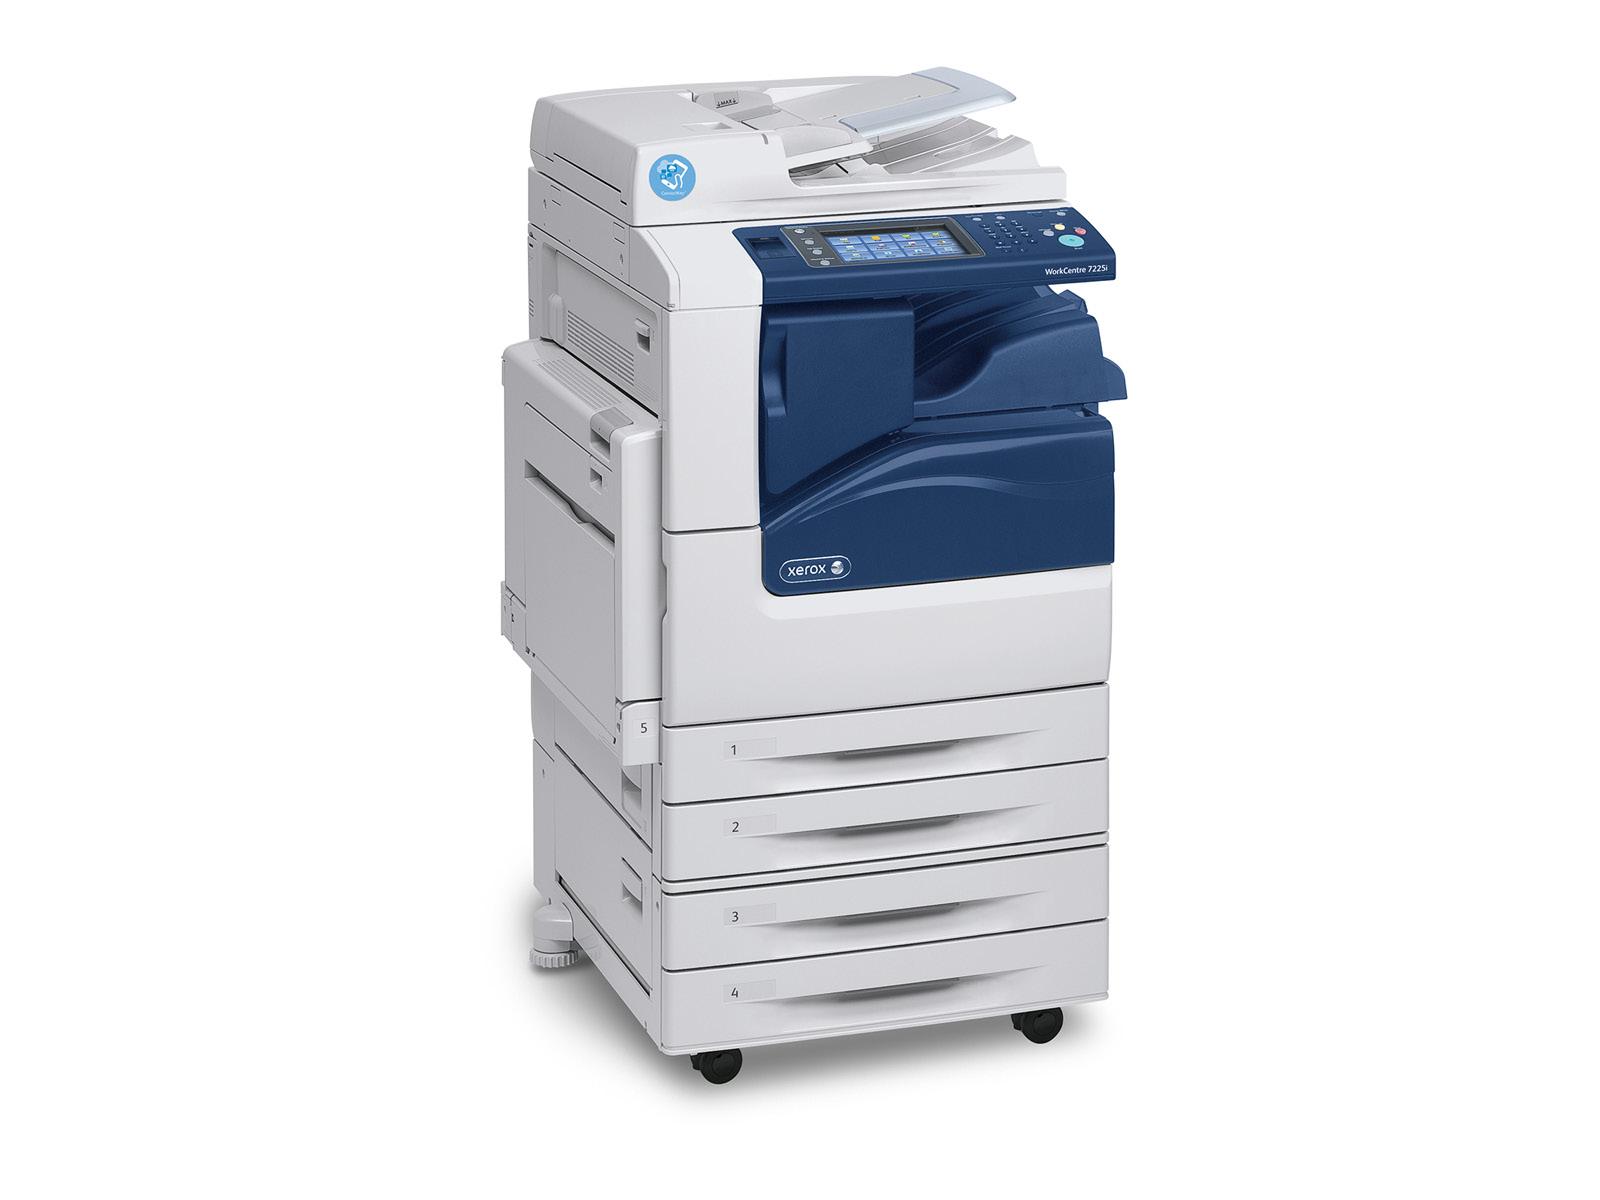 Xerox WorkCentre 7220i/7225i - Document Network Services Ltd